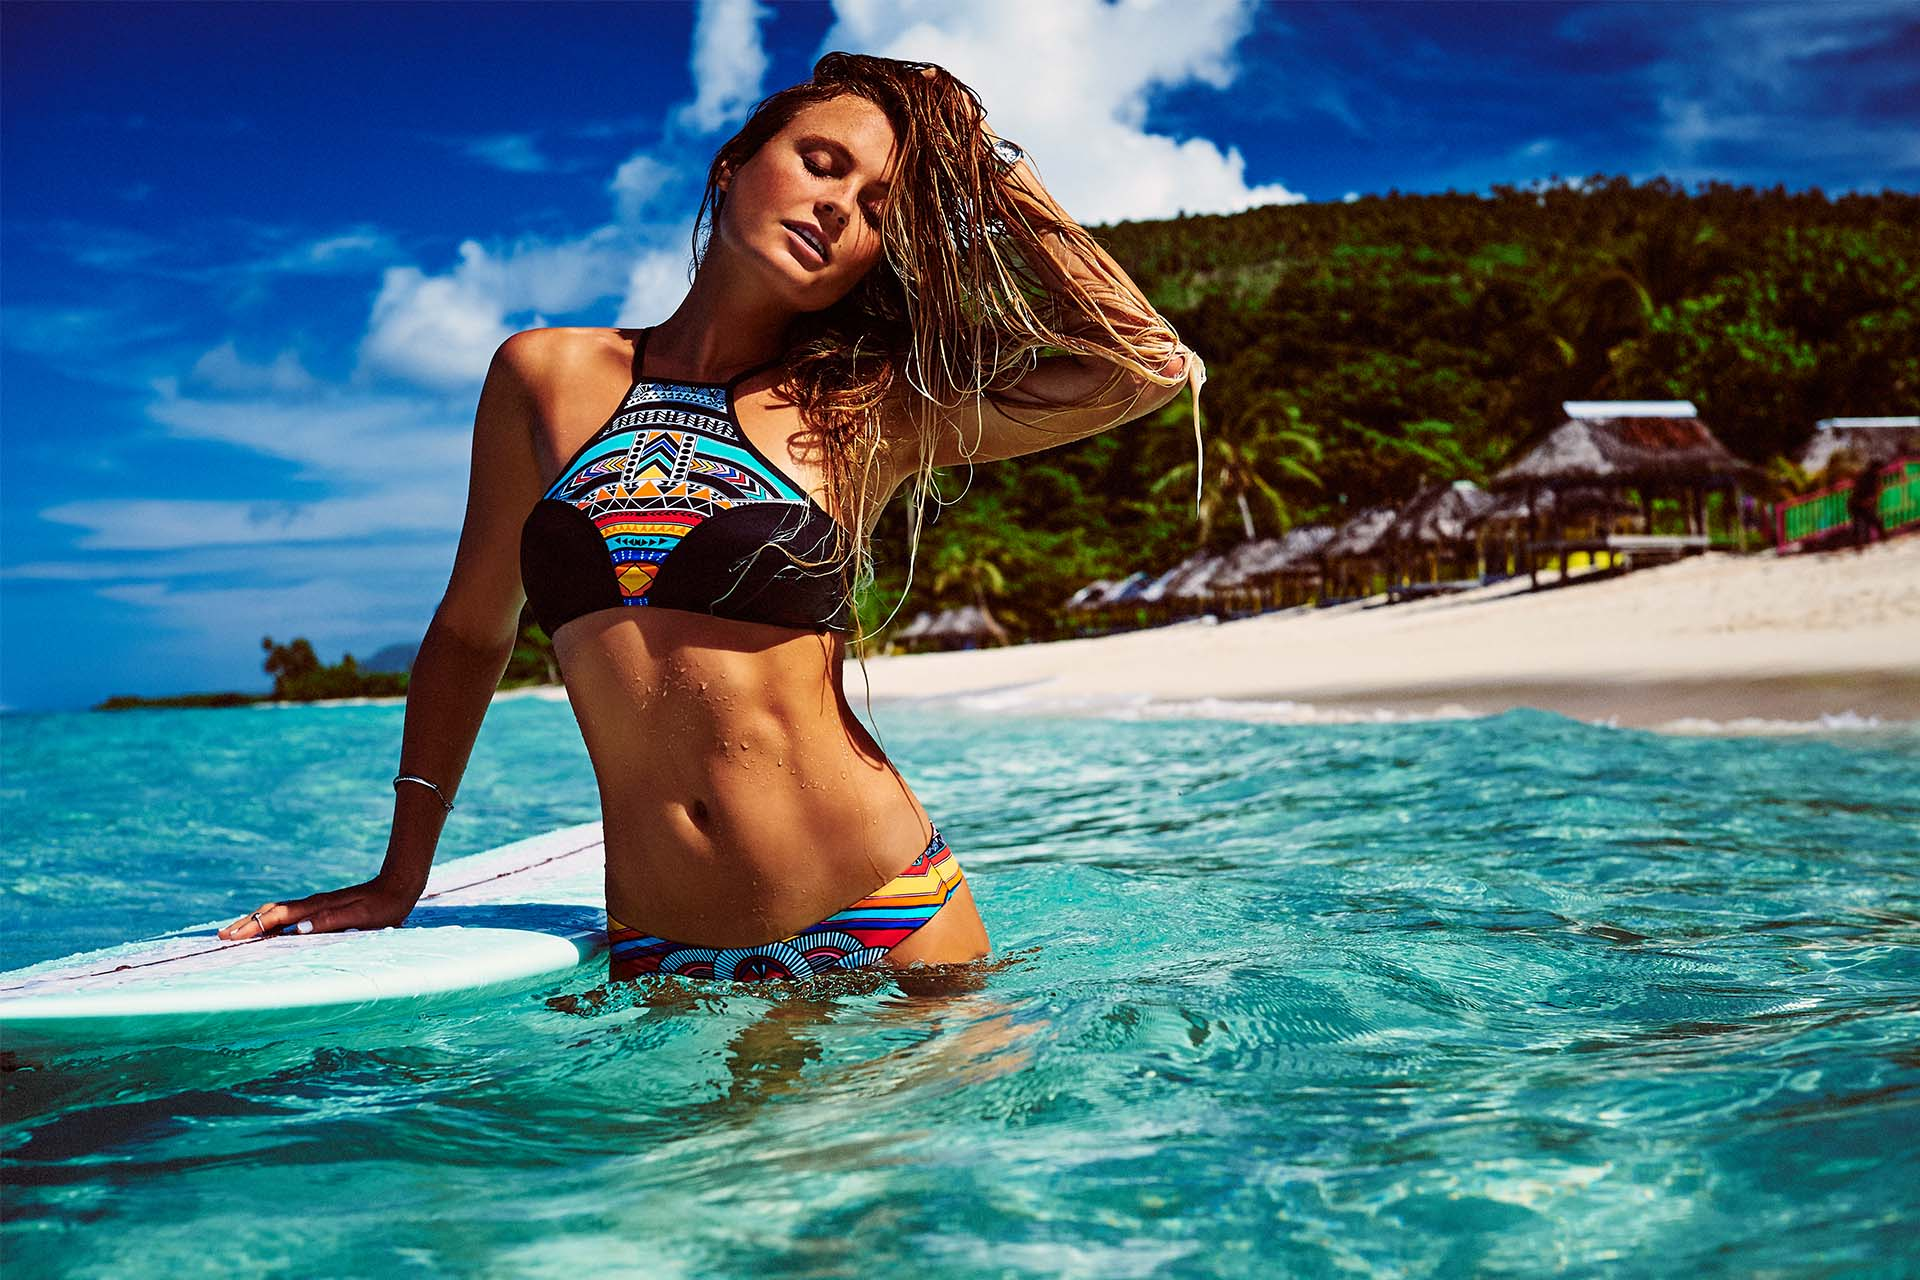 Las Surfers Más Sexys De Instagram Px Sports 247 Action